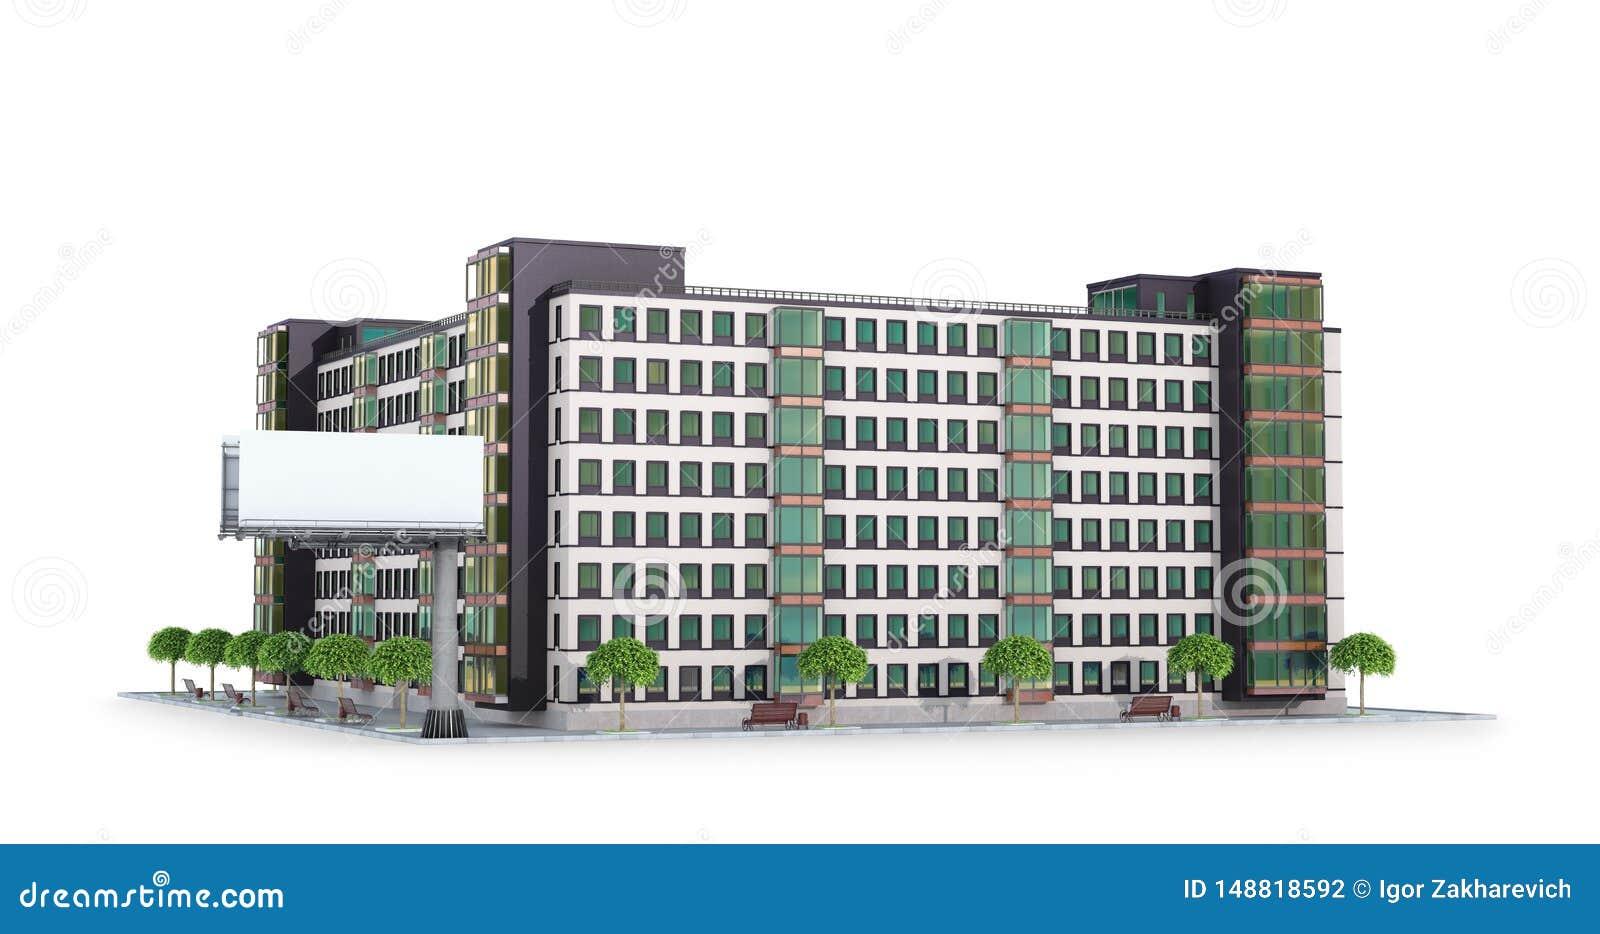 Condominium or modern residential building.